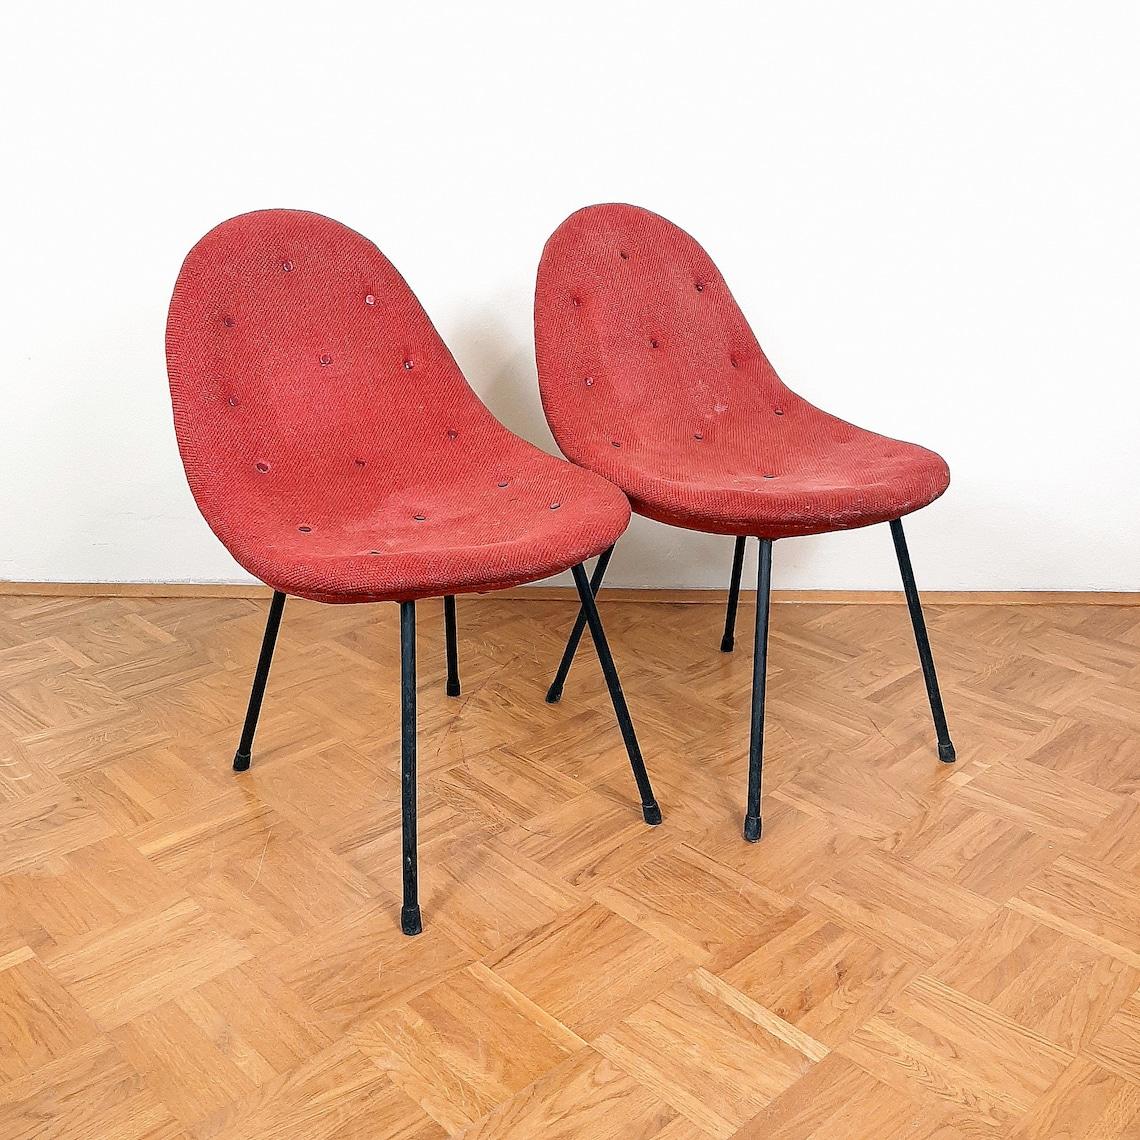 Pair of Mid-century Cocktail Armchair 1963 Italian style Yugoslavia Red Chair Lounge Armchair Original textil Vintage chair